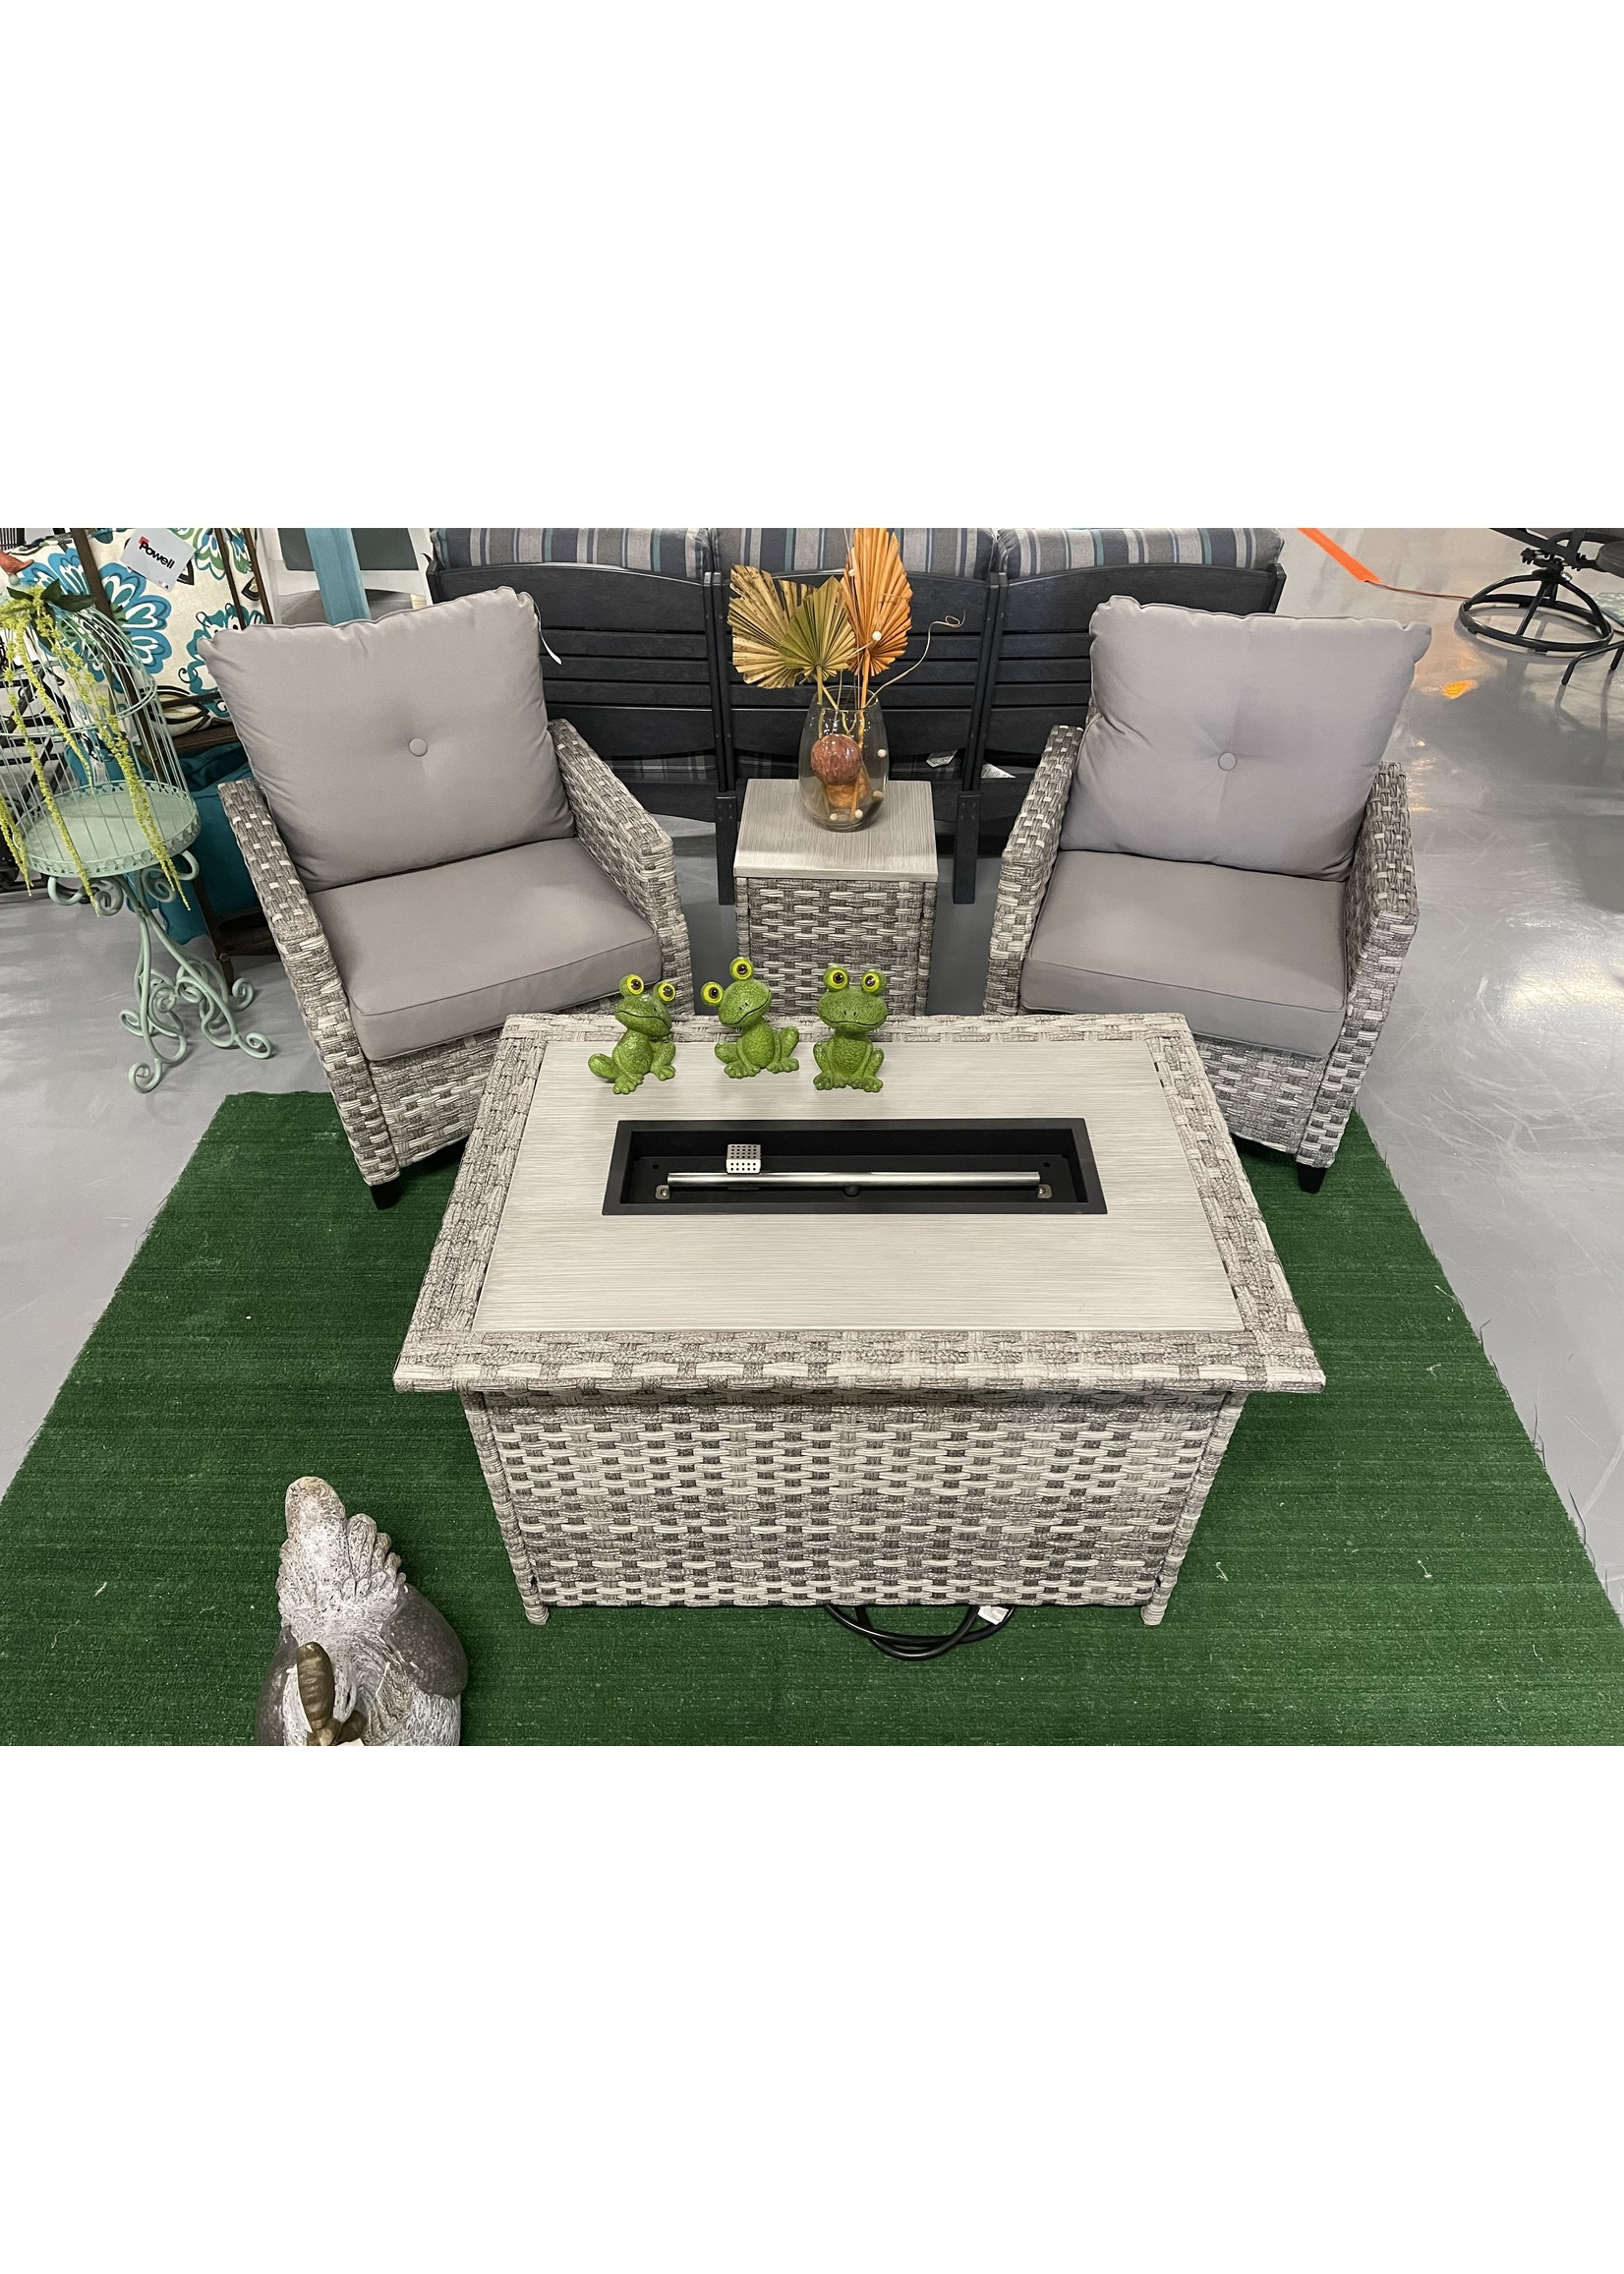 kingston casual costa mesa 4 pc patio set gray mix